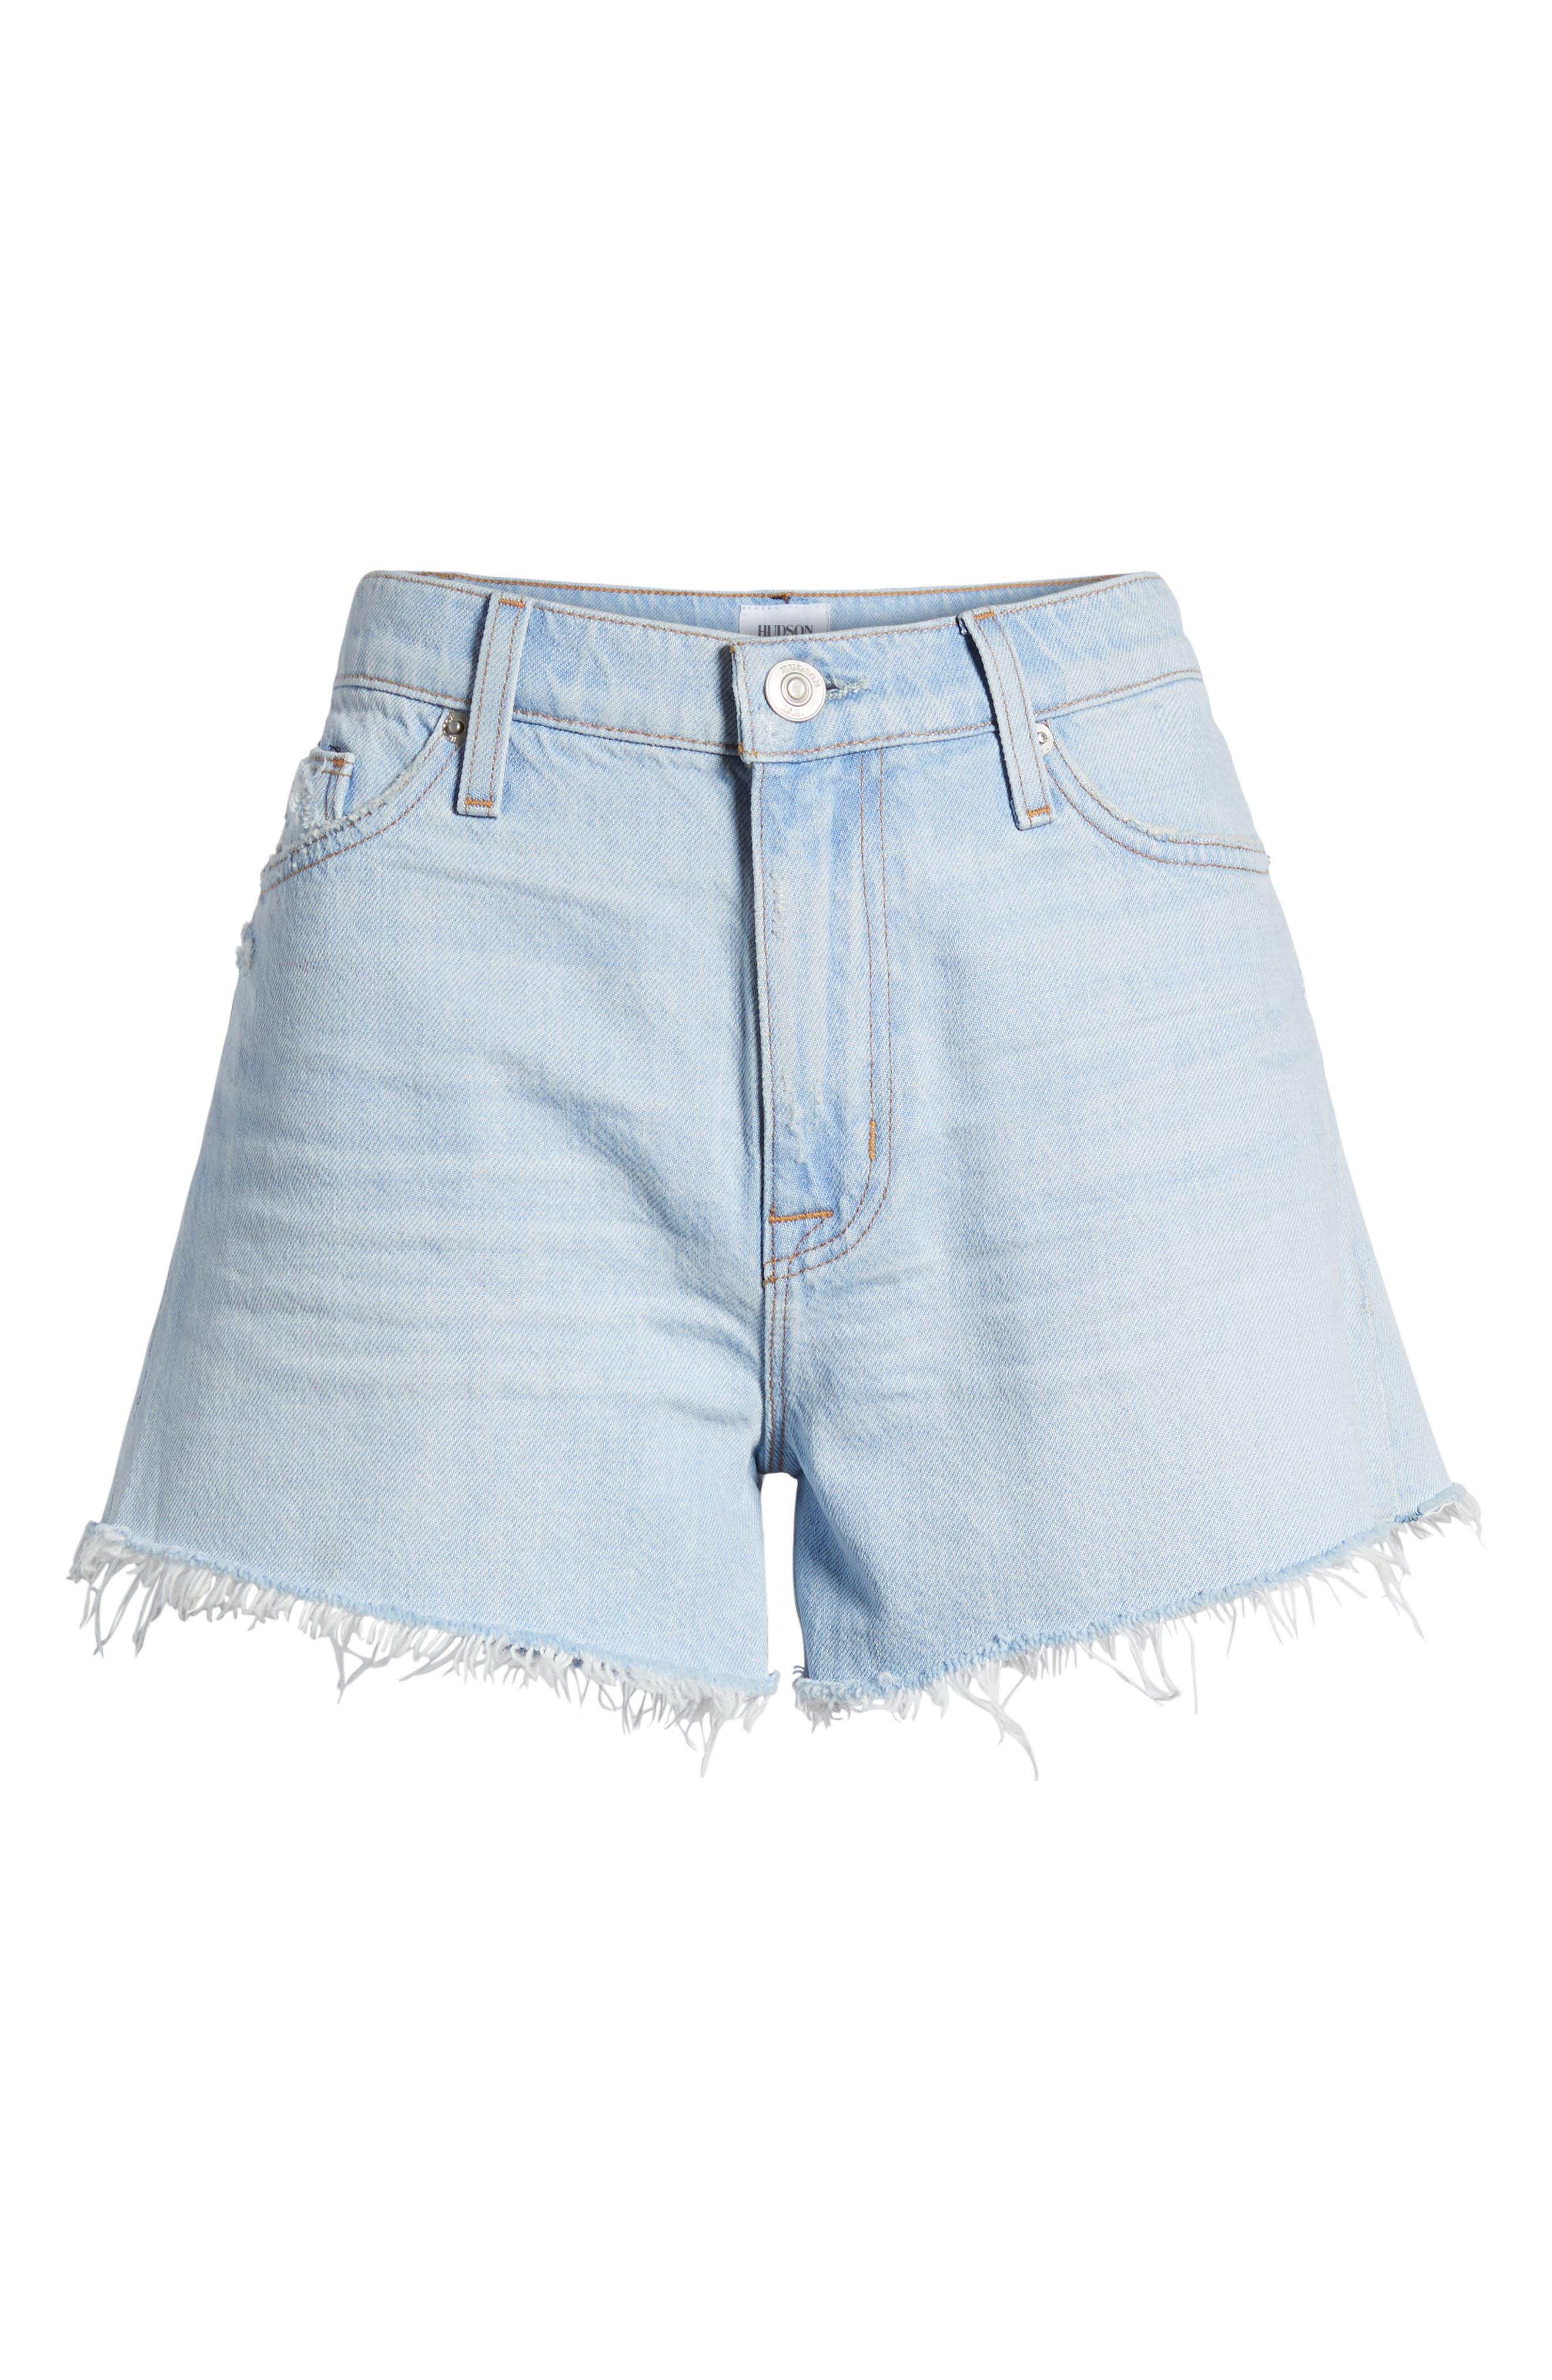 Sade Cutoff Denim Shorts,                             Alternate thumbnail 7, color,                             460